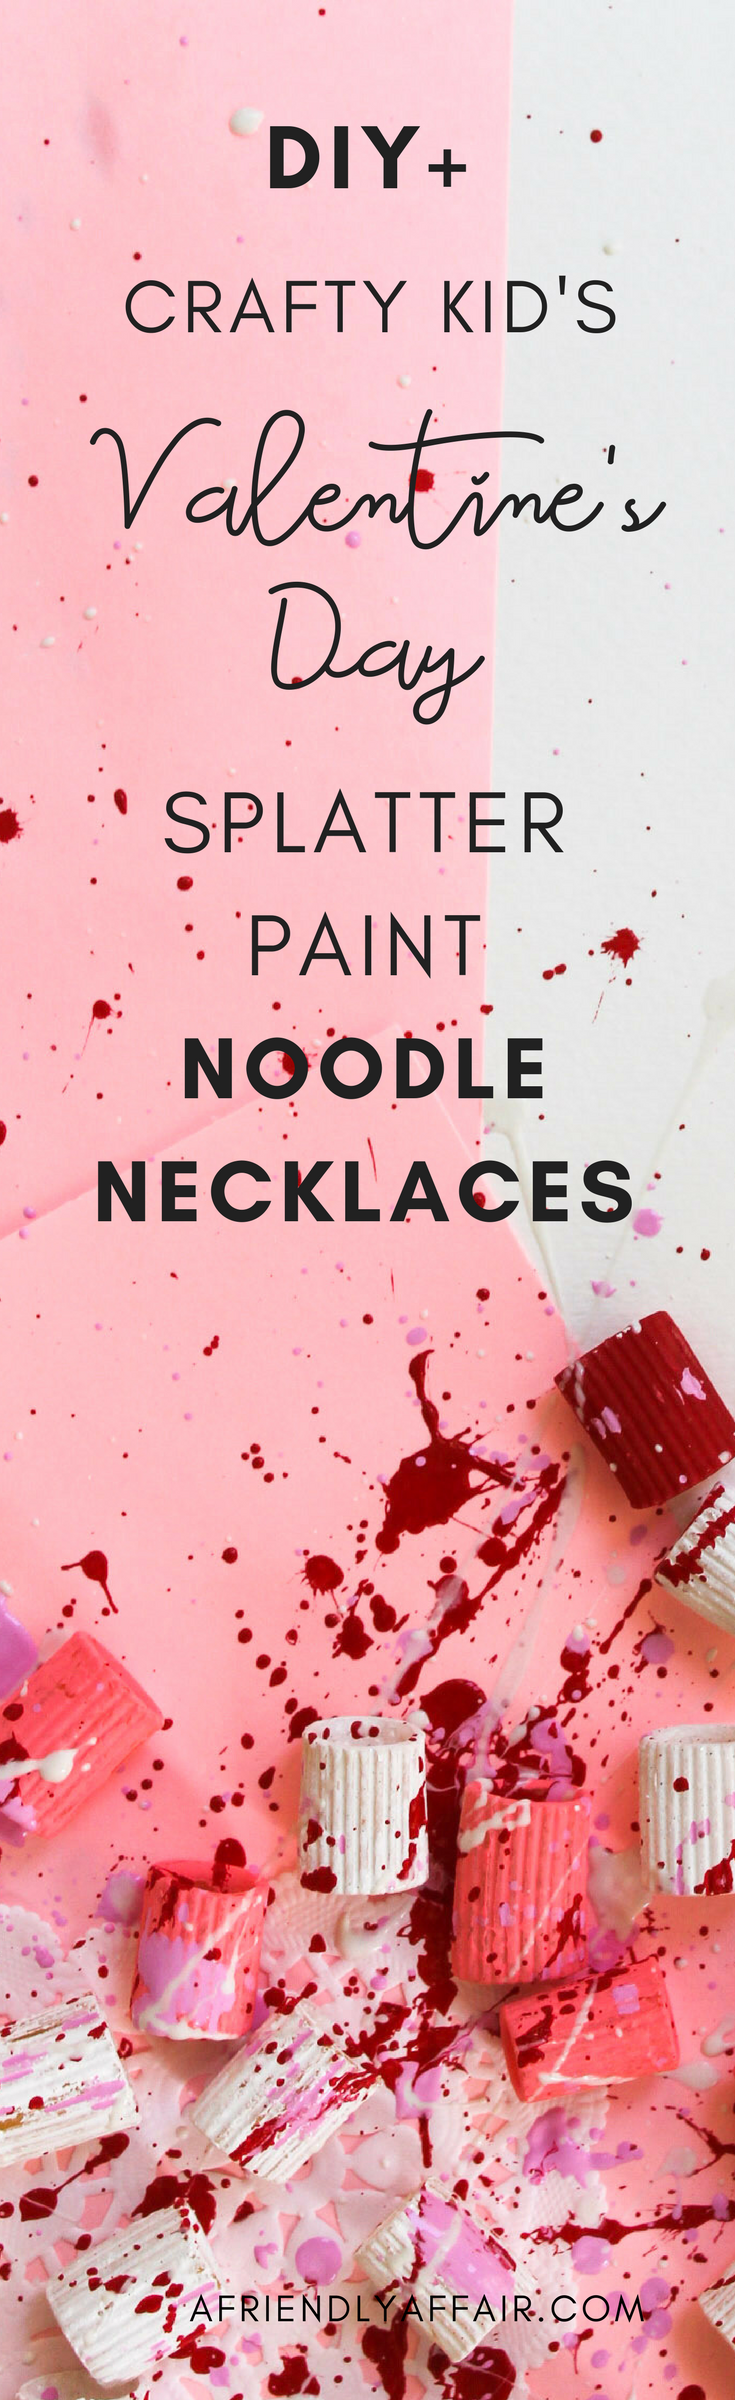 Copy of V-Day Noodle necklaces 5.png